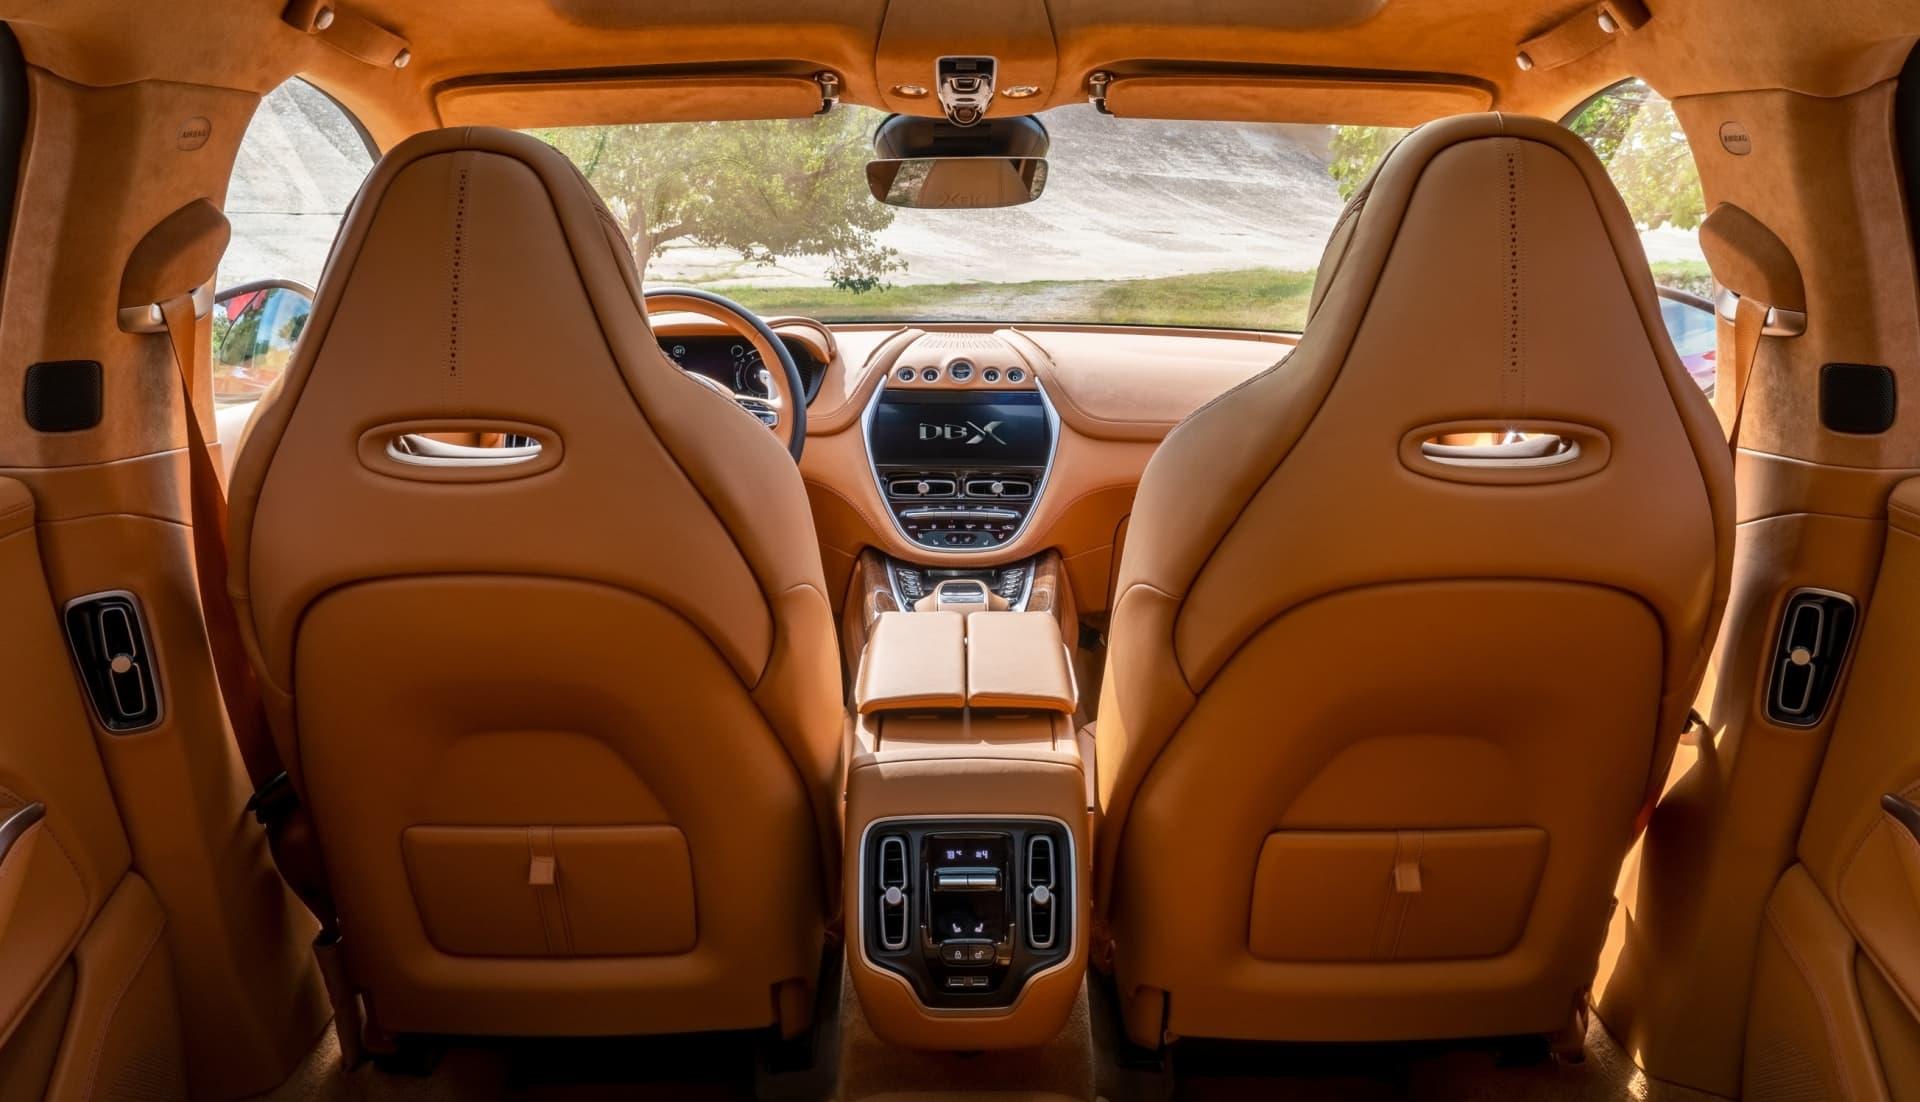 Aston Martin Dbx Interior 1019 03